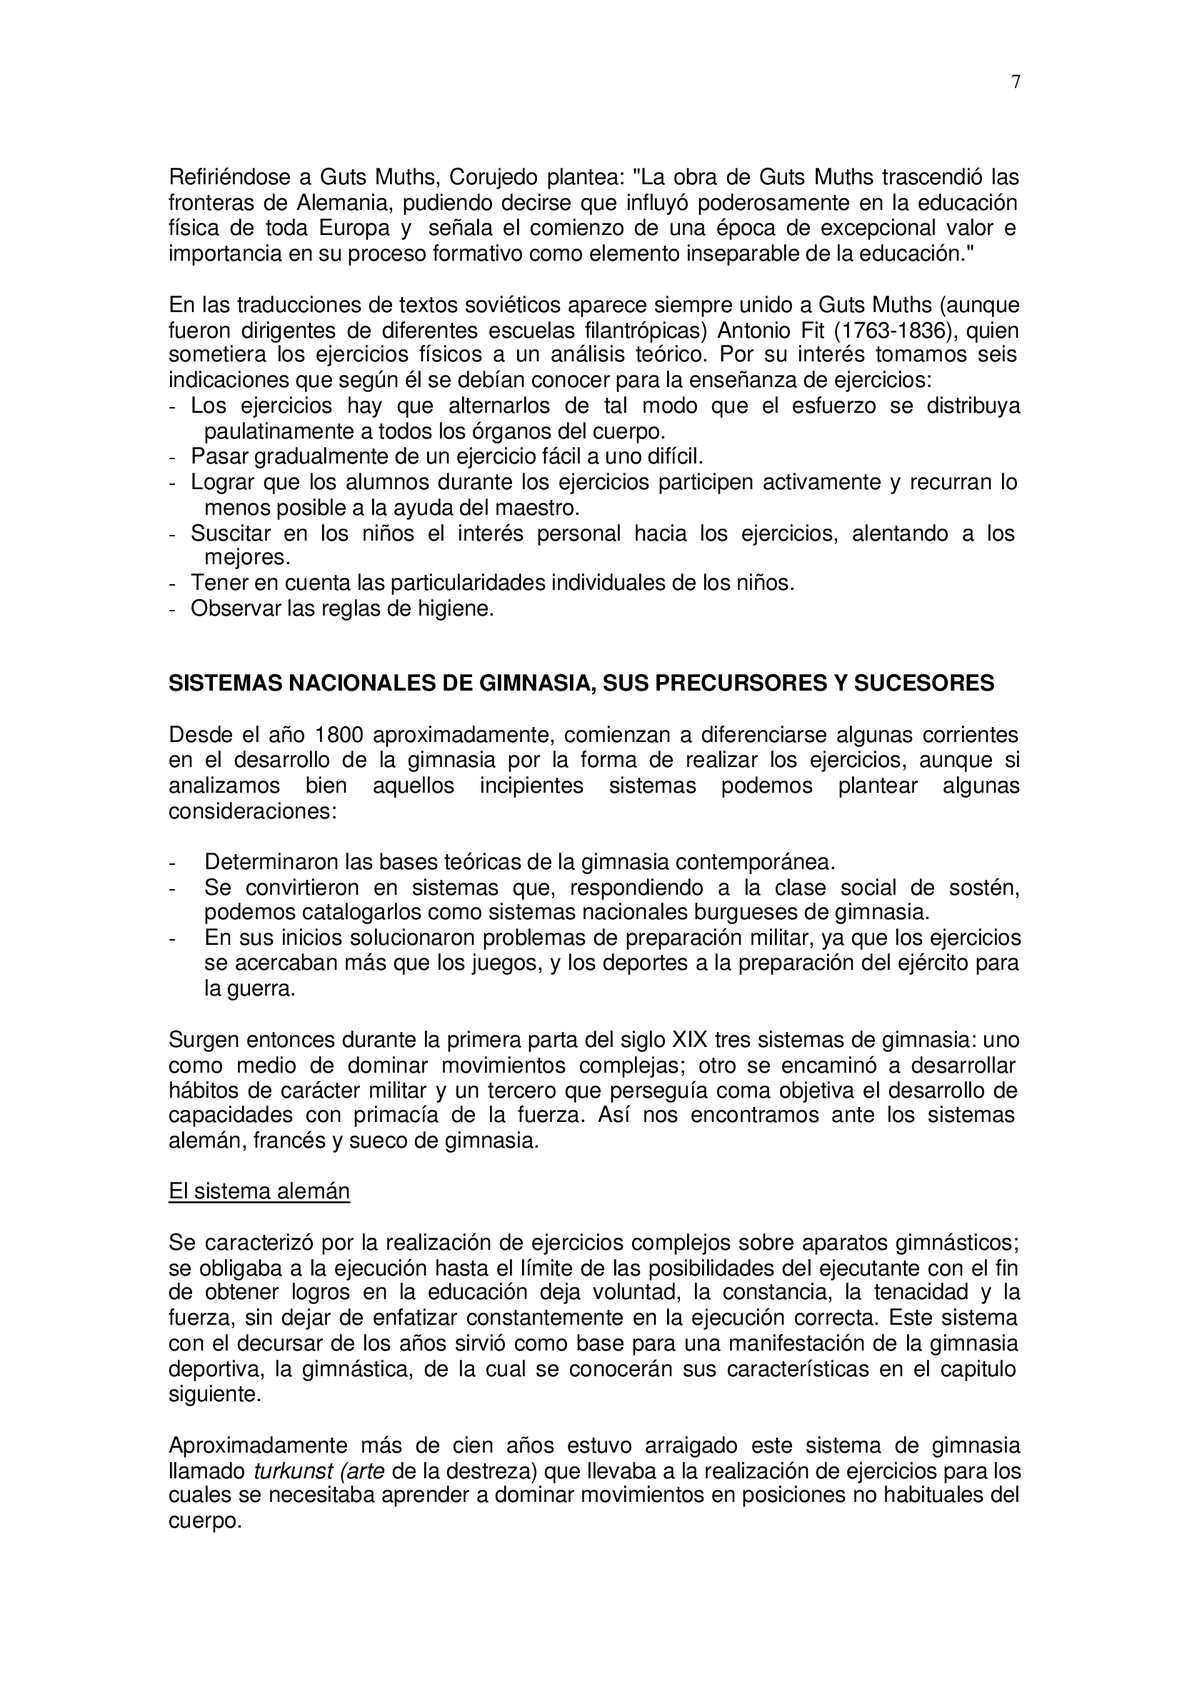 MANUAL DE GIMNASIA BASICA - CALAMEO Downloader